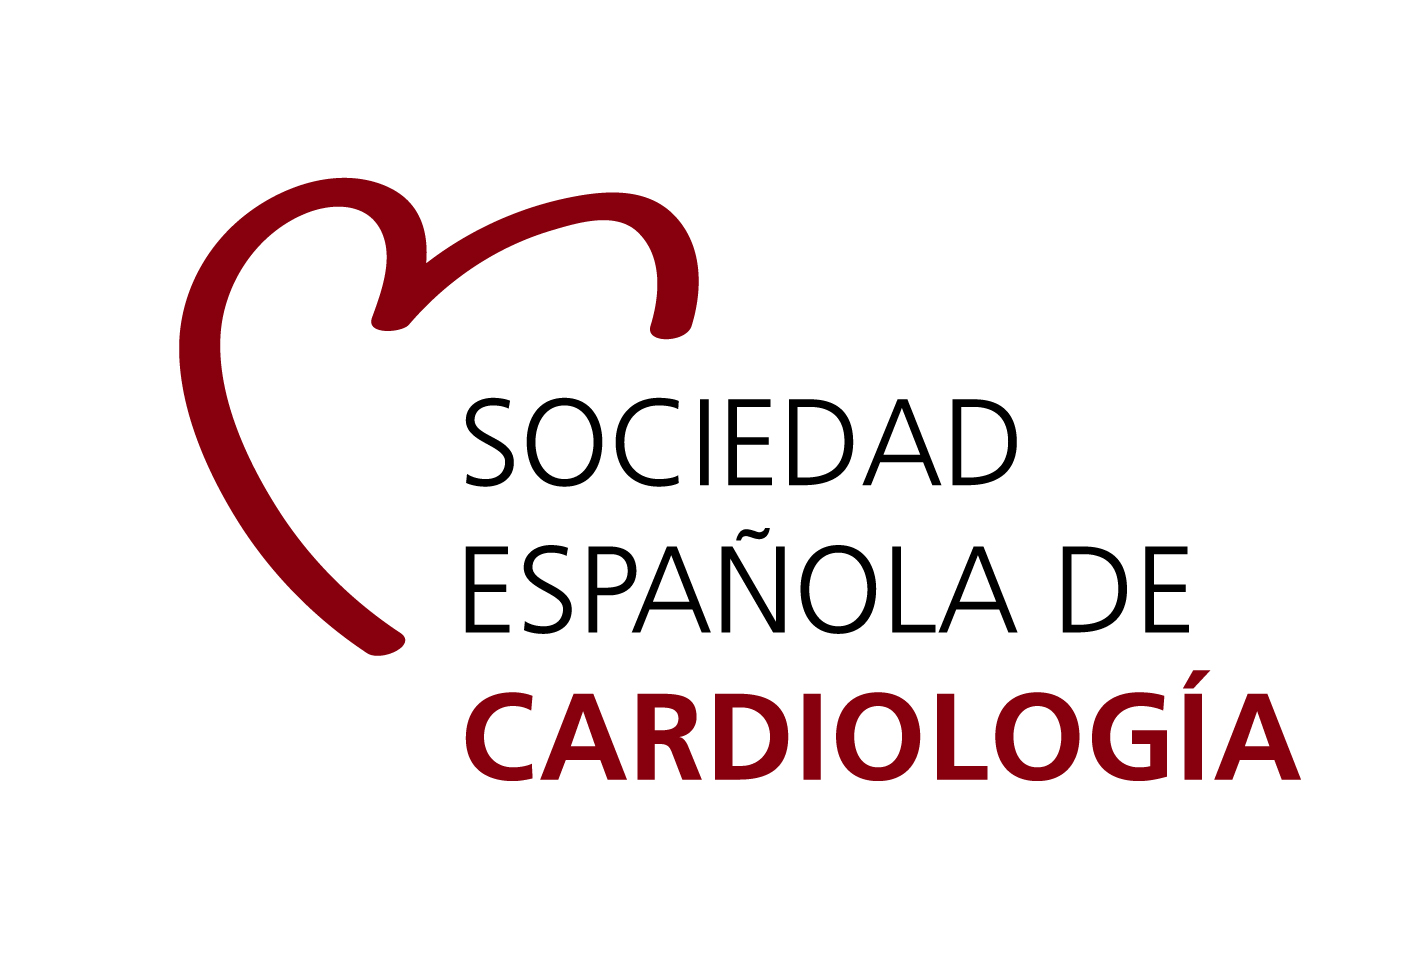 Spanish Society of Cardiology